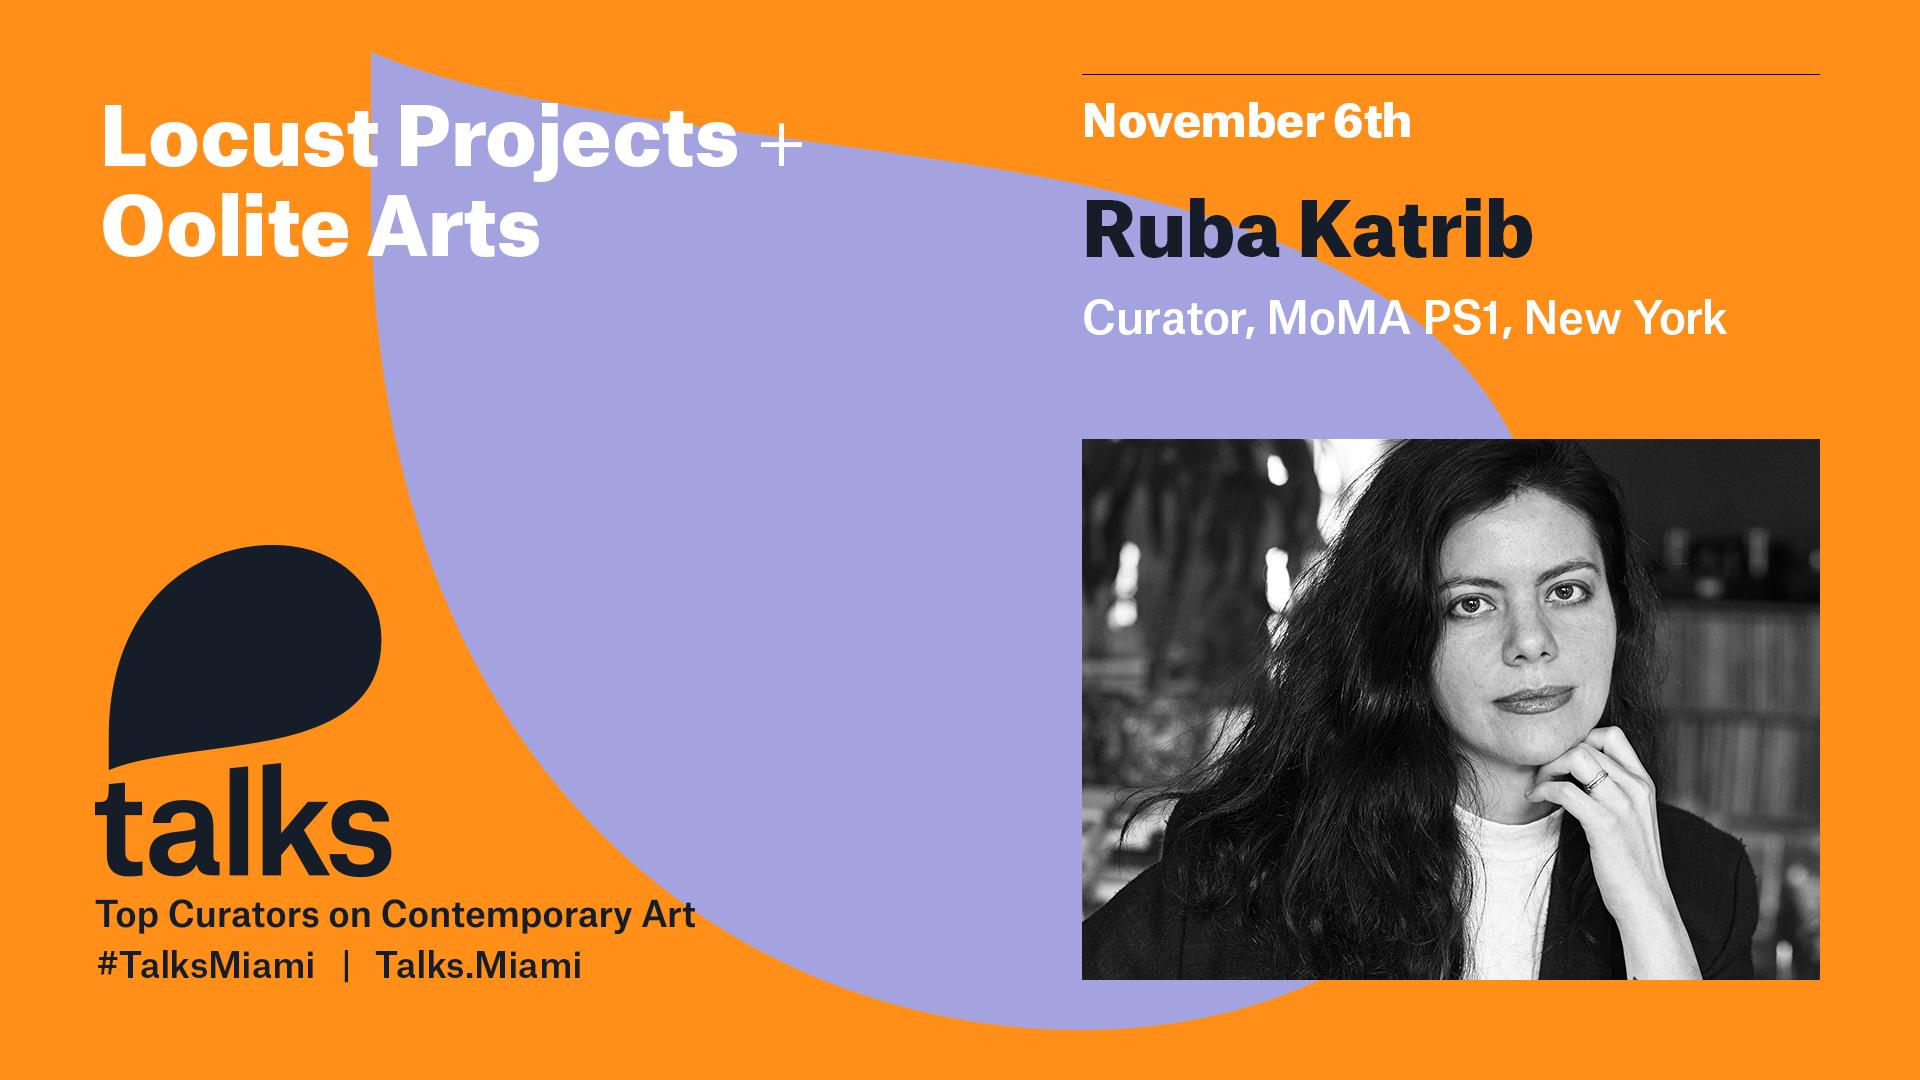 Register now for Talks with Ruba Katrib